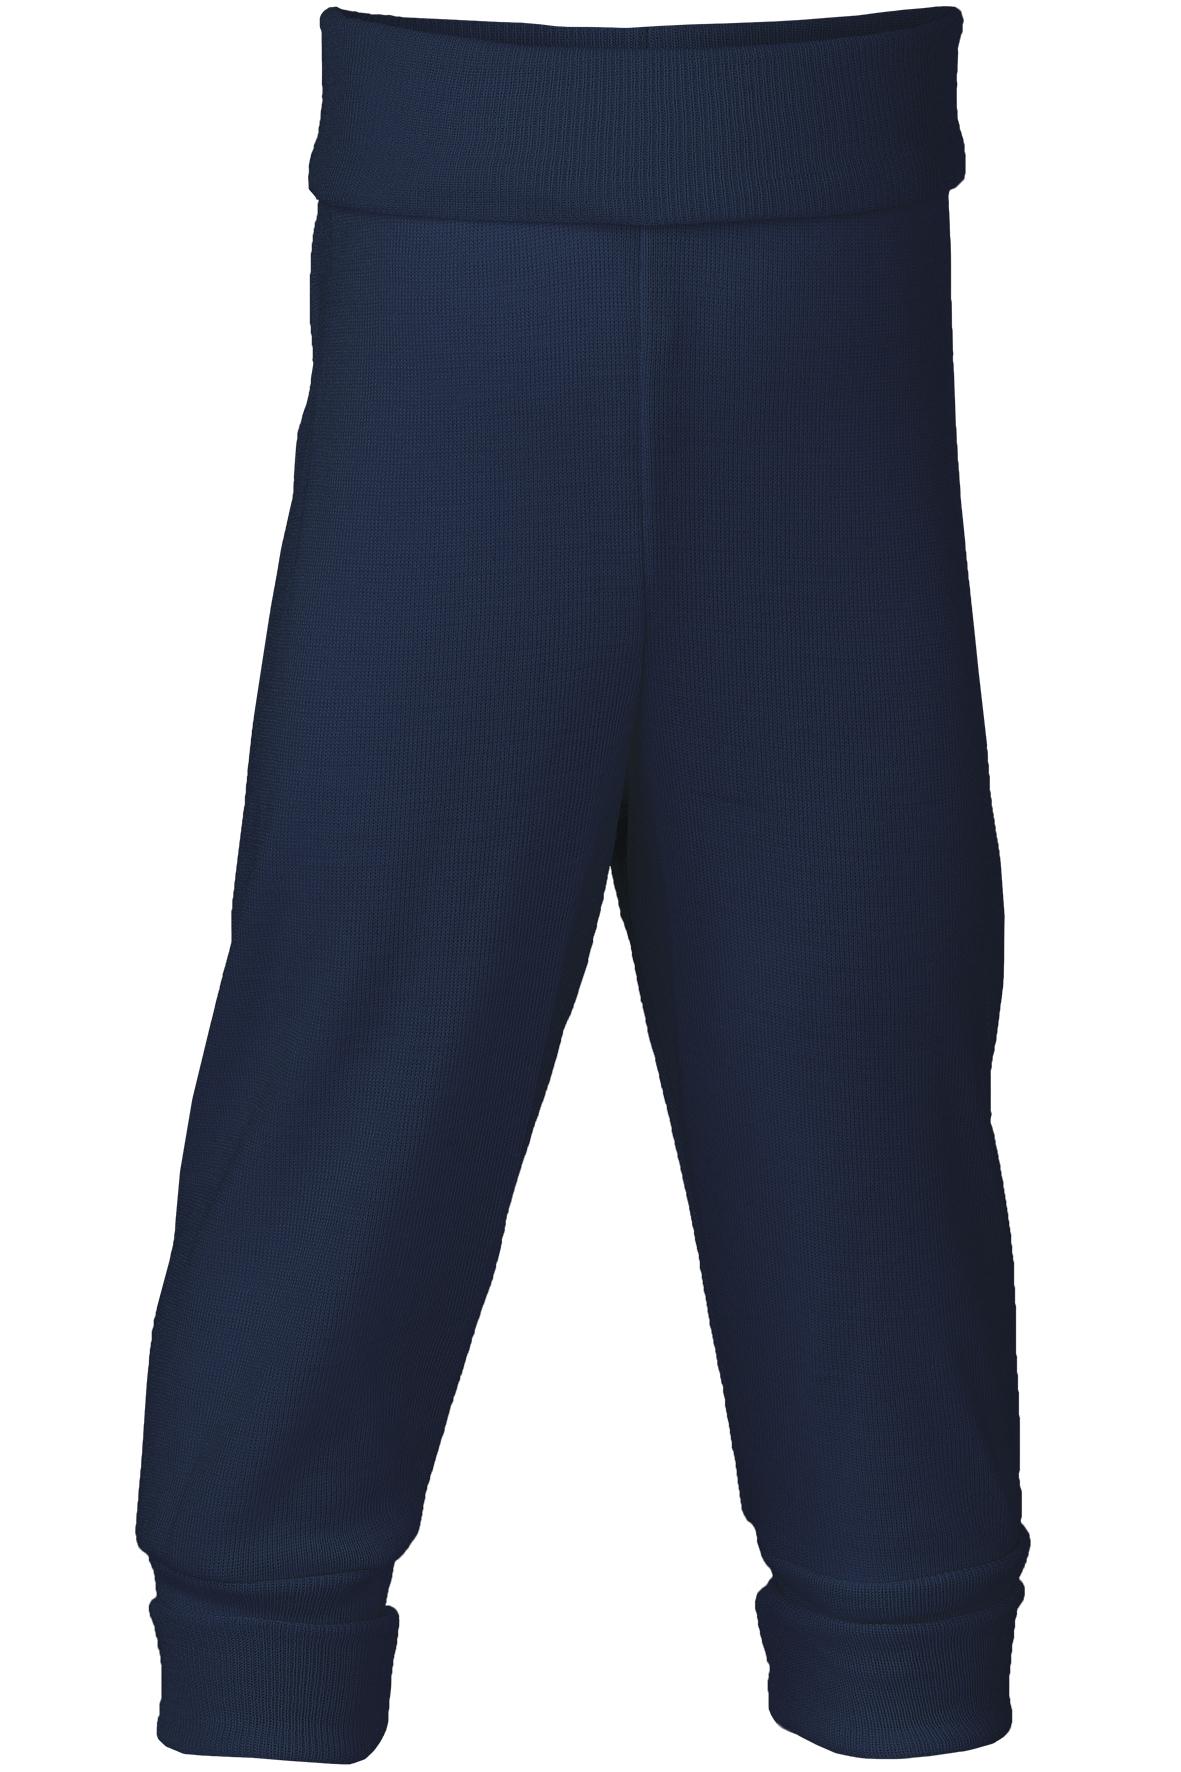 Pantalon à ceinture large Marine ENGEL